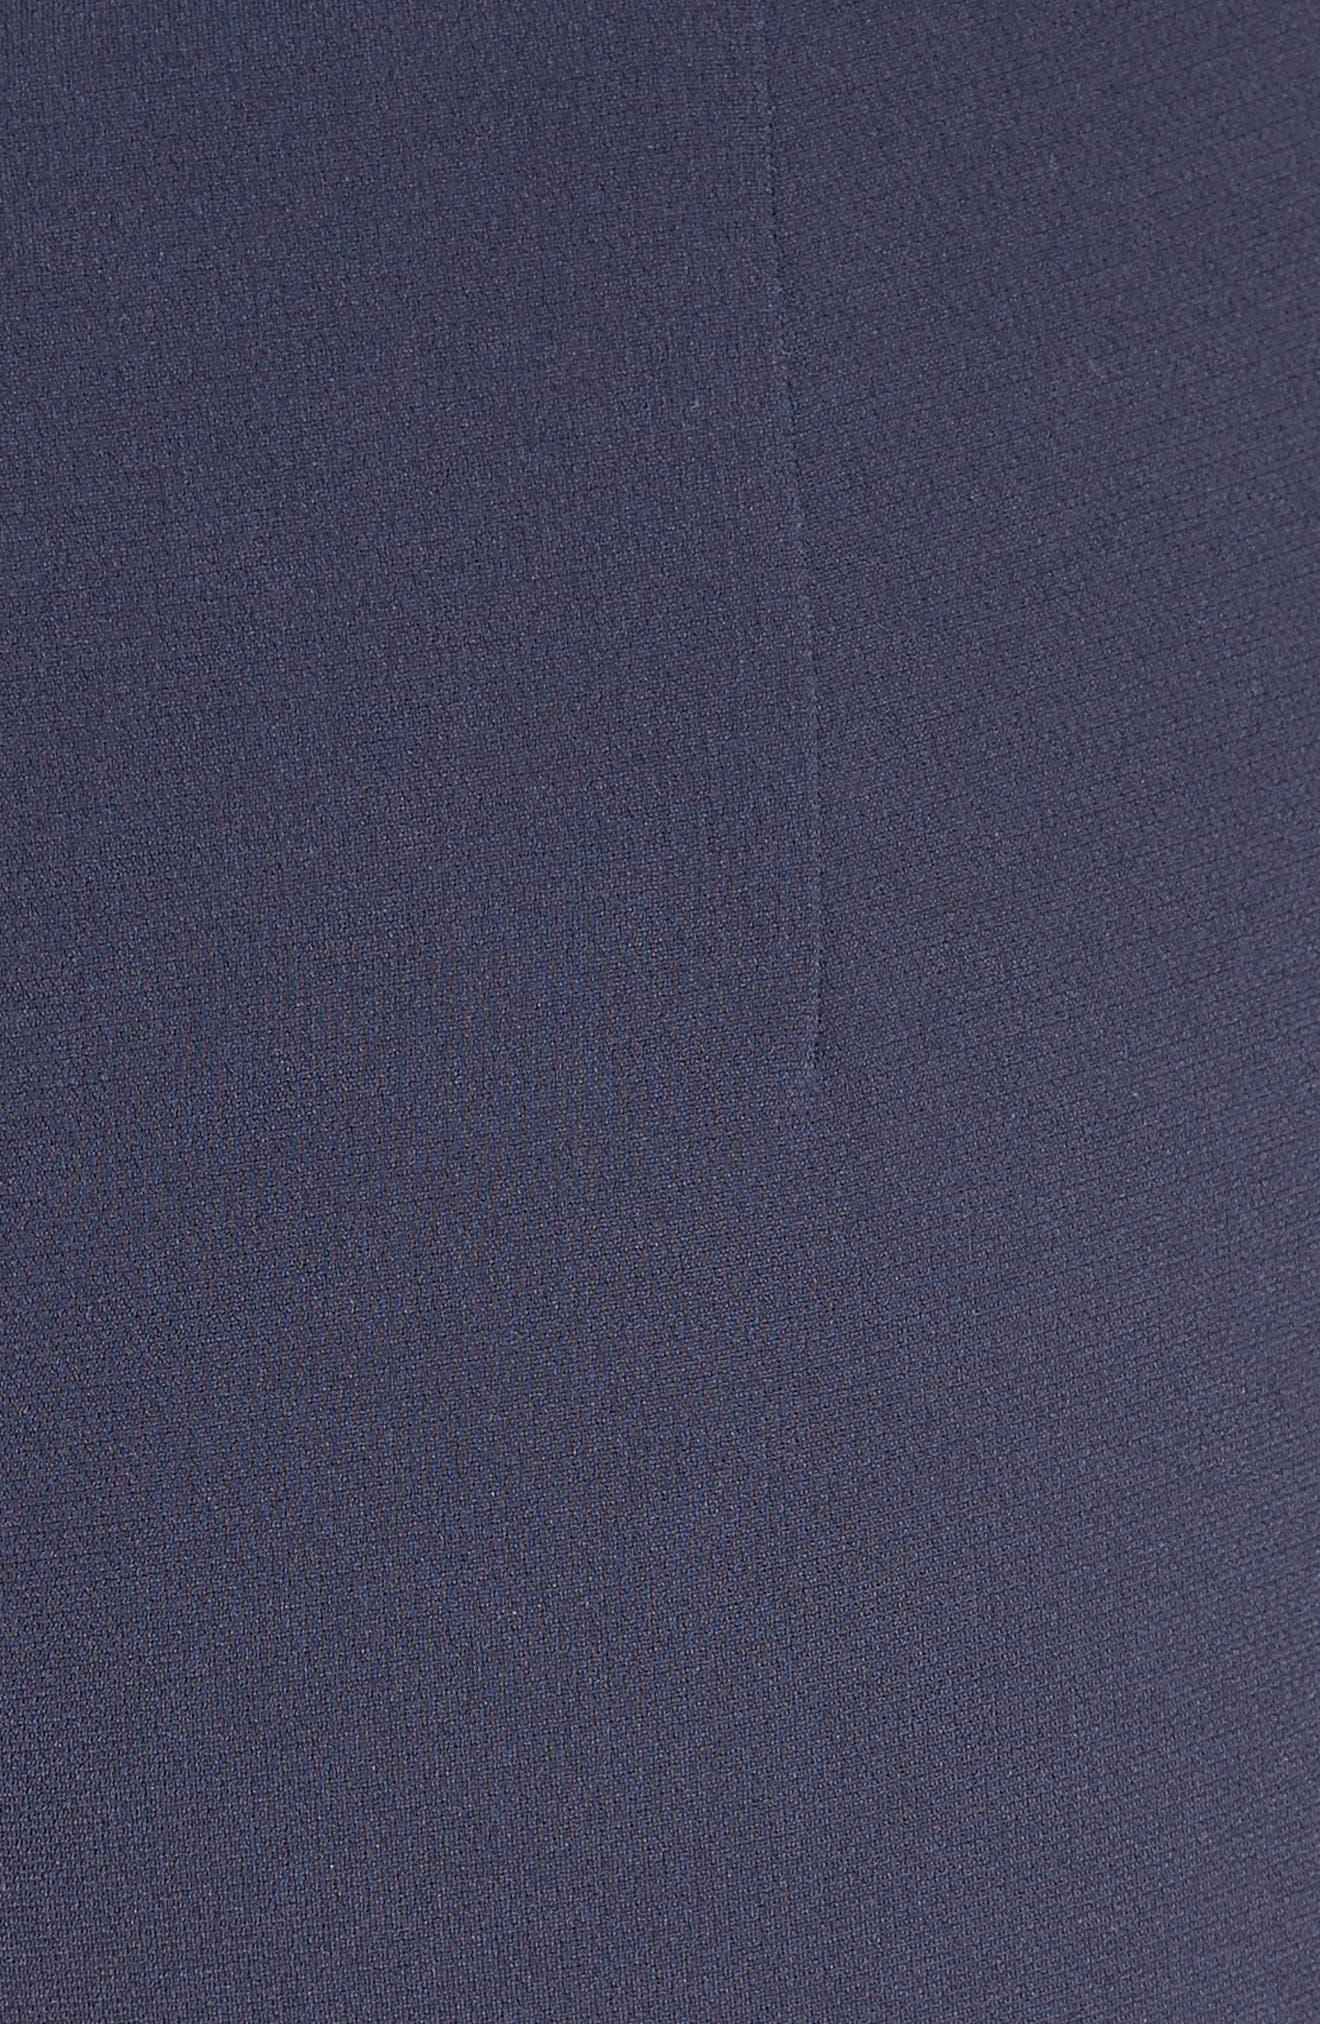 Alcano Crop Pants,                             Alternate thumbnail 5, color,                             411